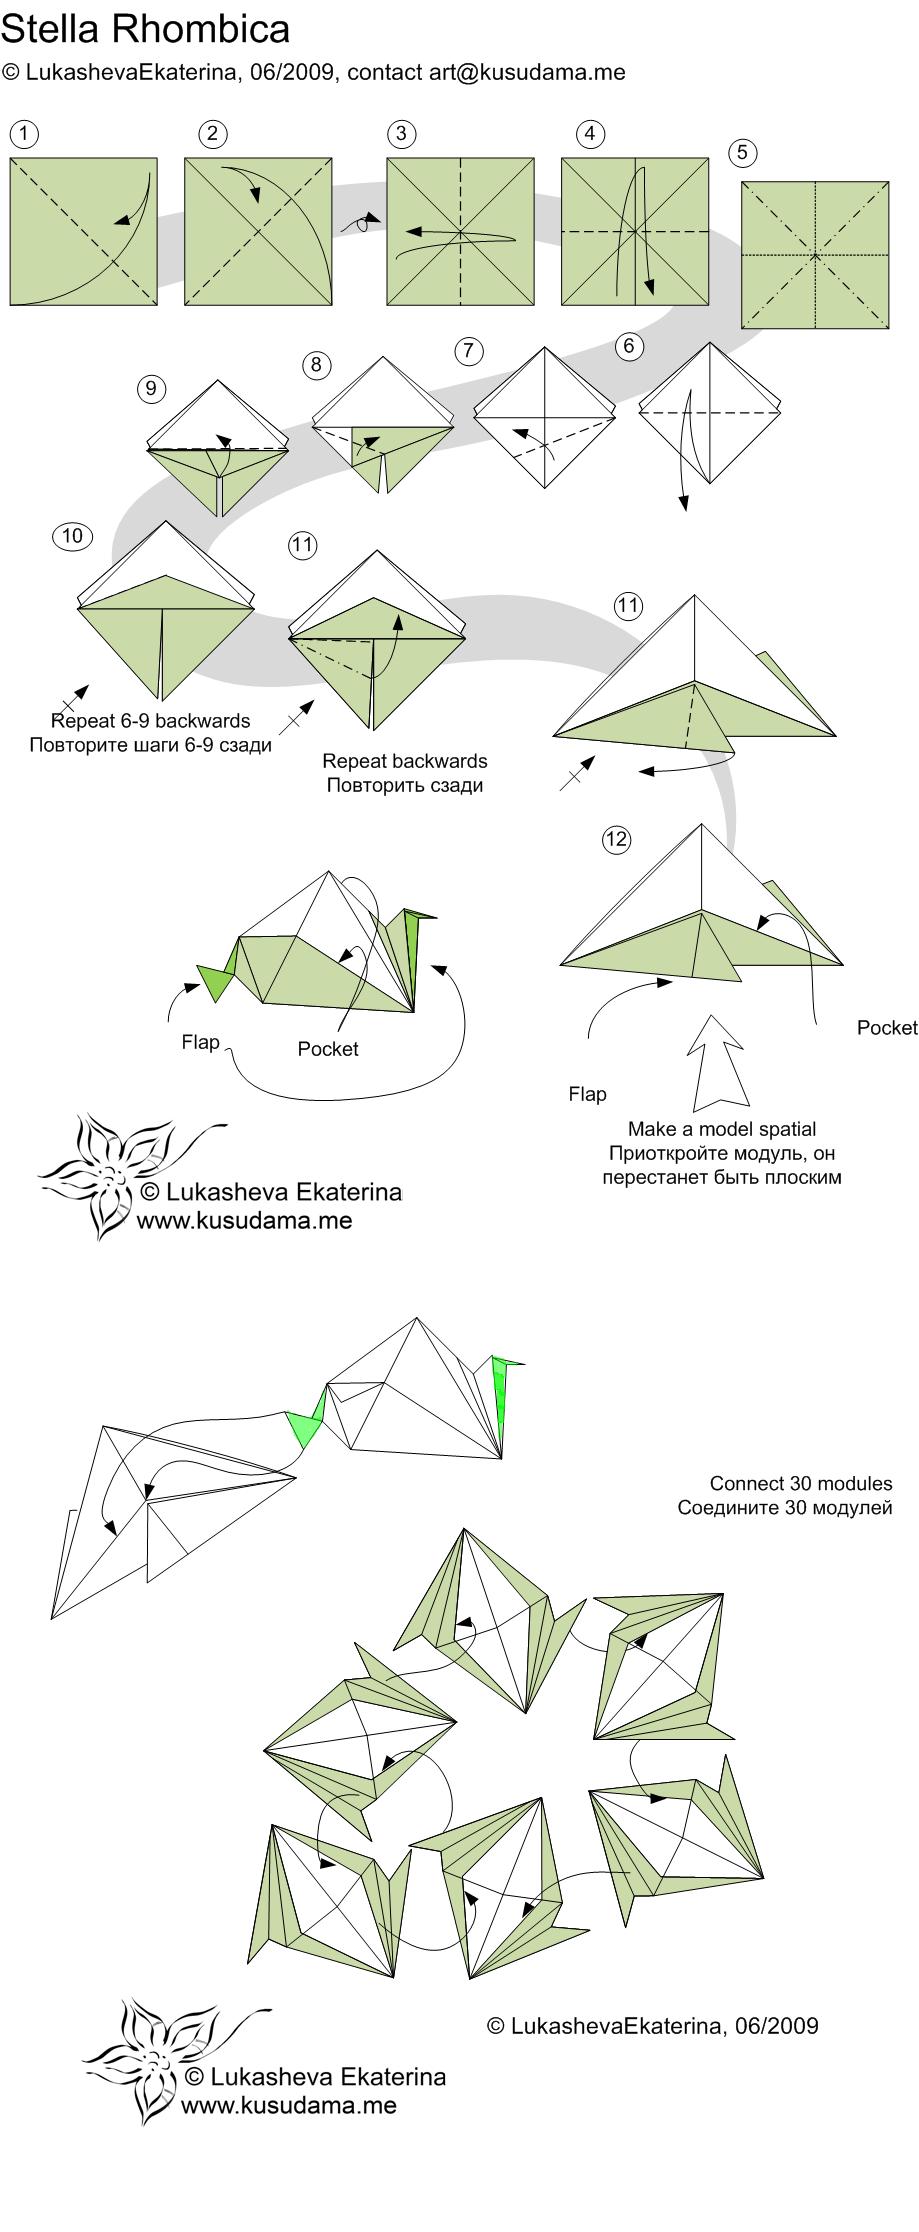 Pin By Jennifer Moreno On Origami Pinterest Modular Diagram Instructions For Stella Rhombica Kusudama